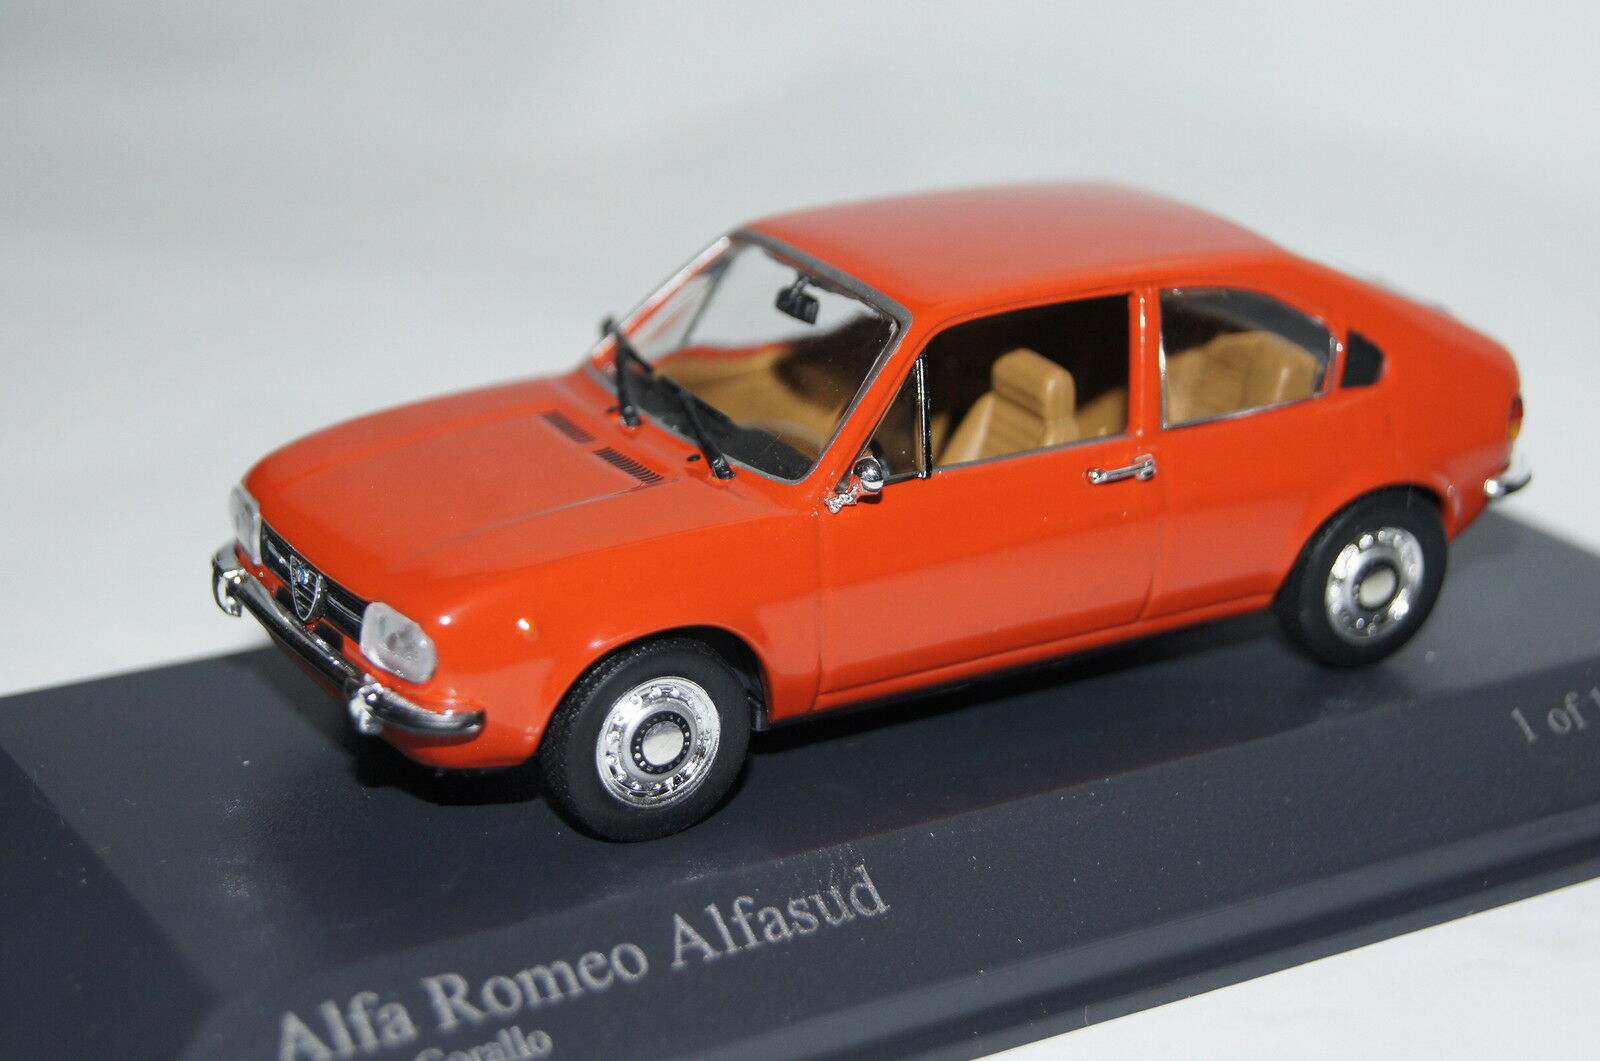 Alfa Romeo Alfasud 1972 rot 1 1 1 43  Minichamps neu & OVP 400120104 c12067